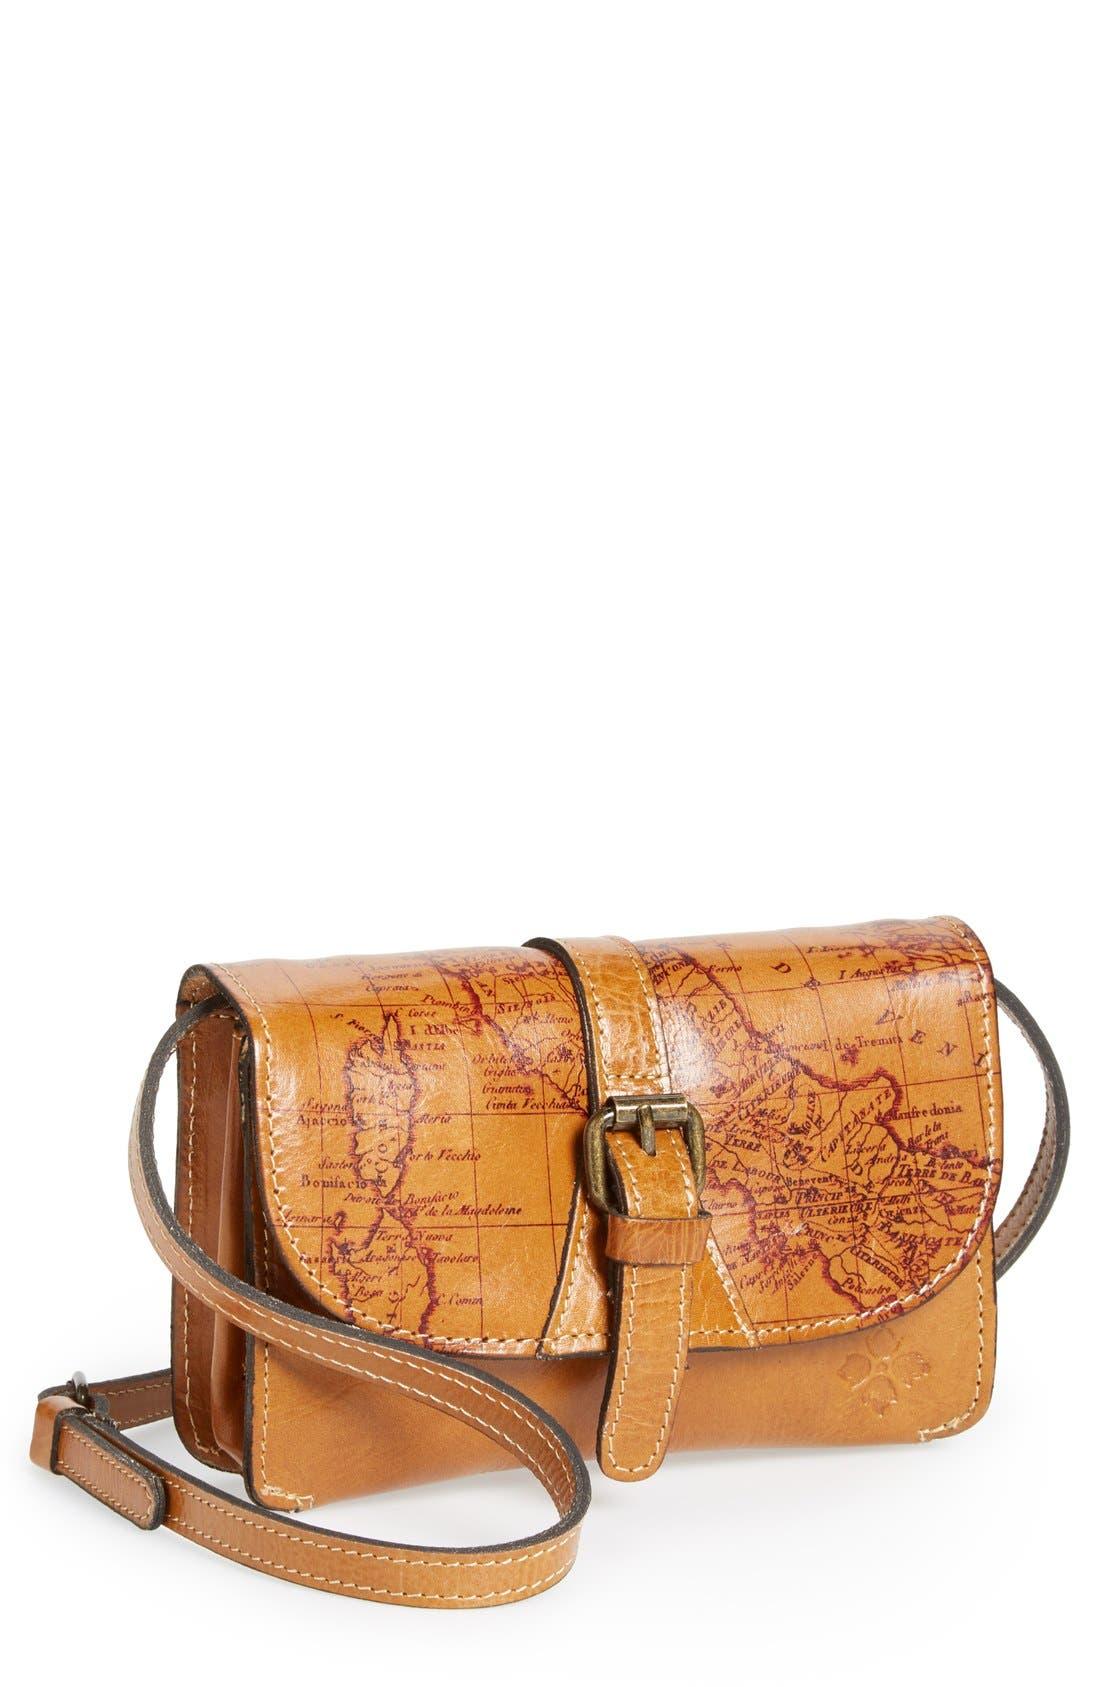 Main Image - Patricia Nash 'Torri' Leather Crossbody Bag